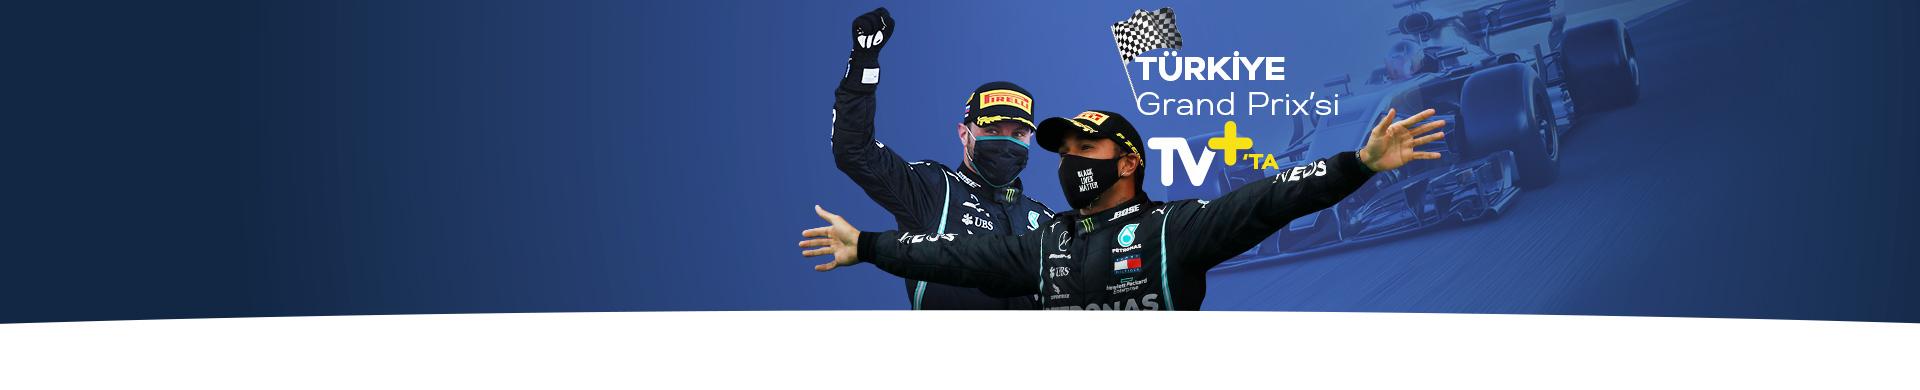 Formula 1 İstanbul GP TV+'ta